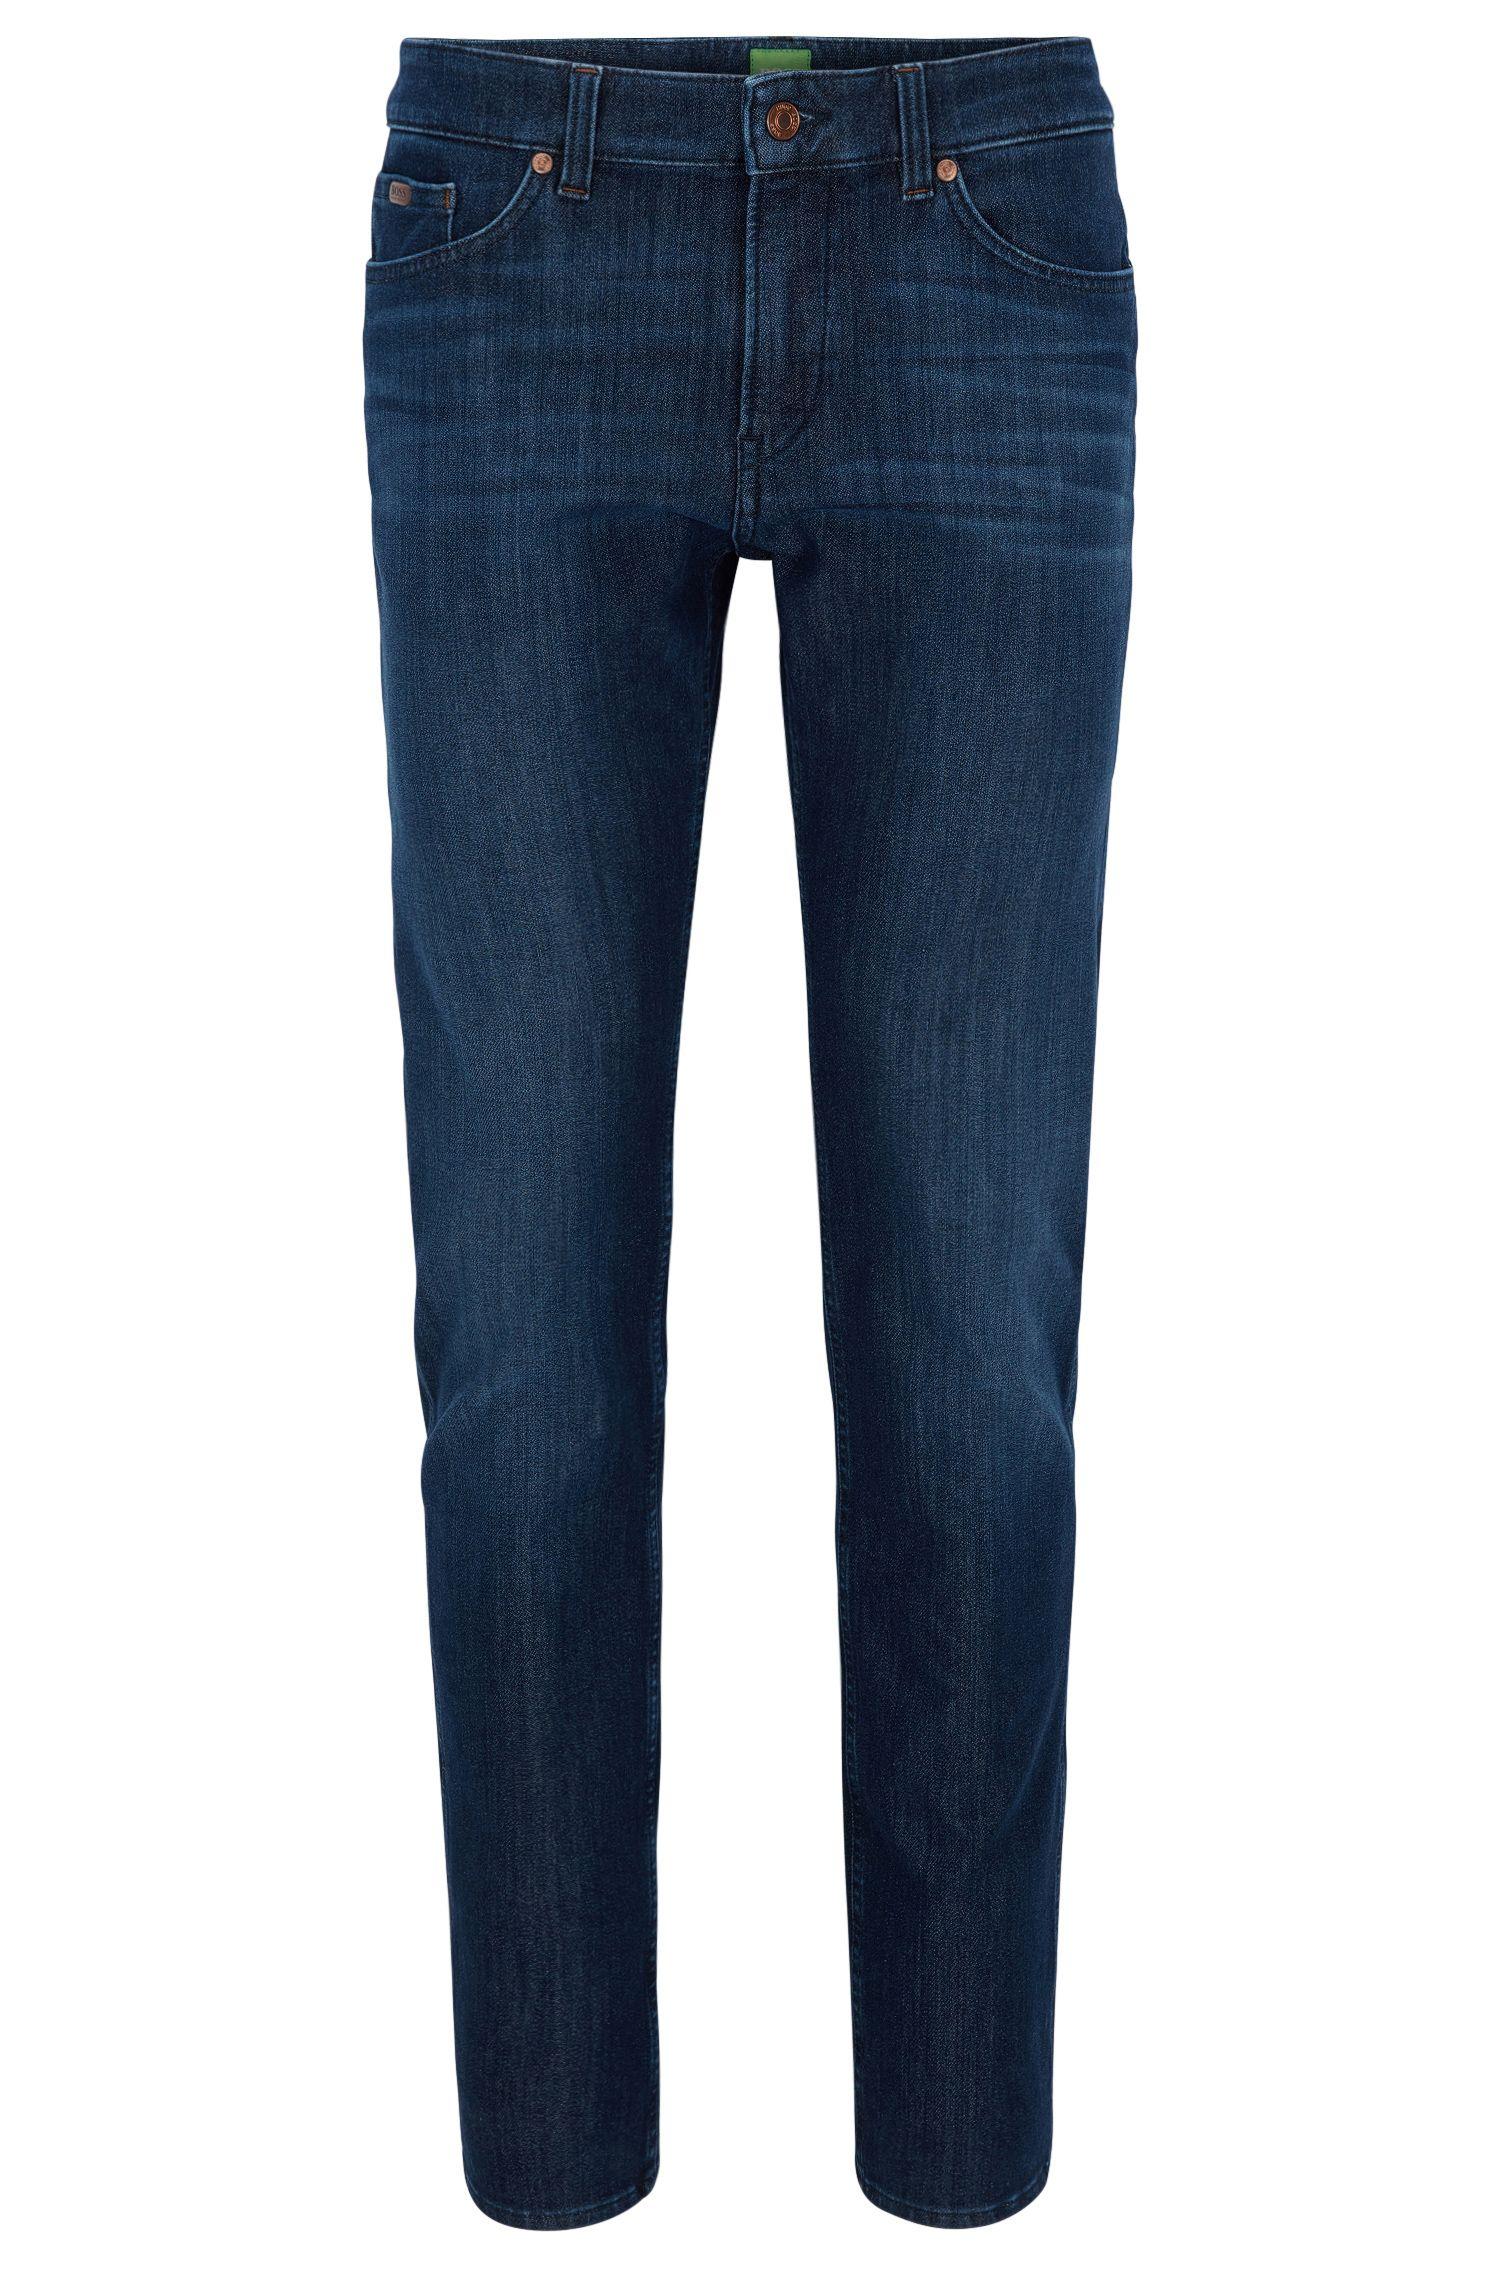 Jeans Slim Fit en denim indigo stretch